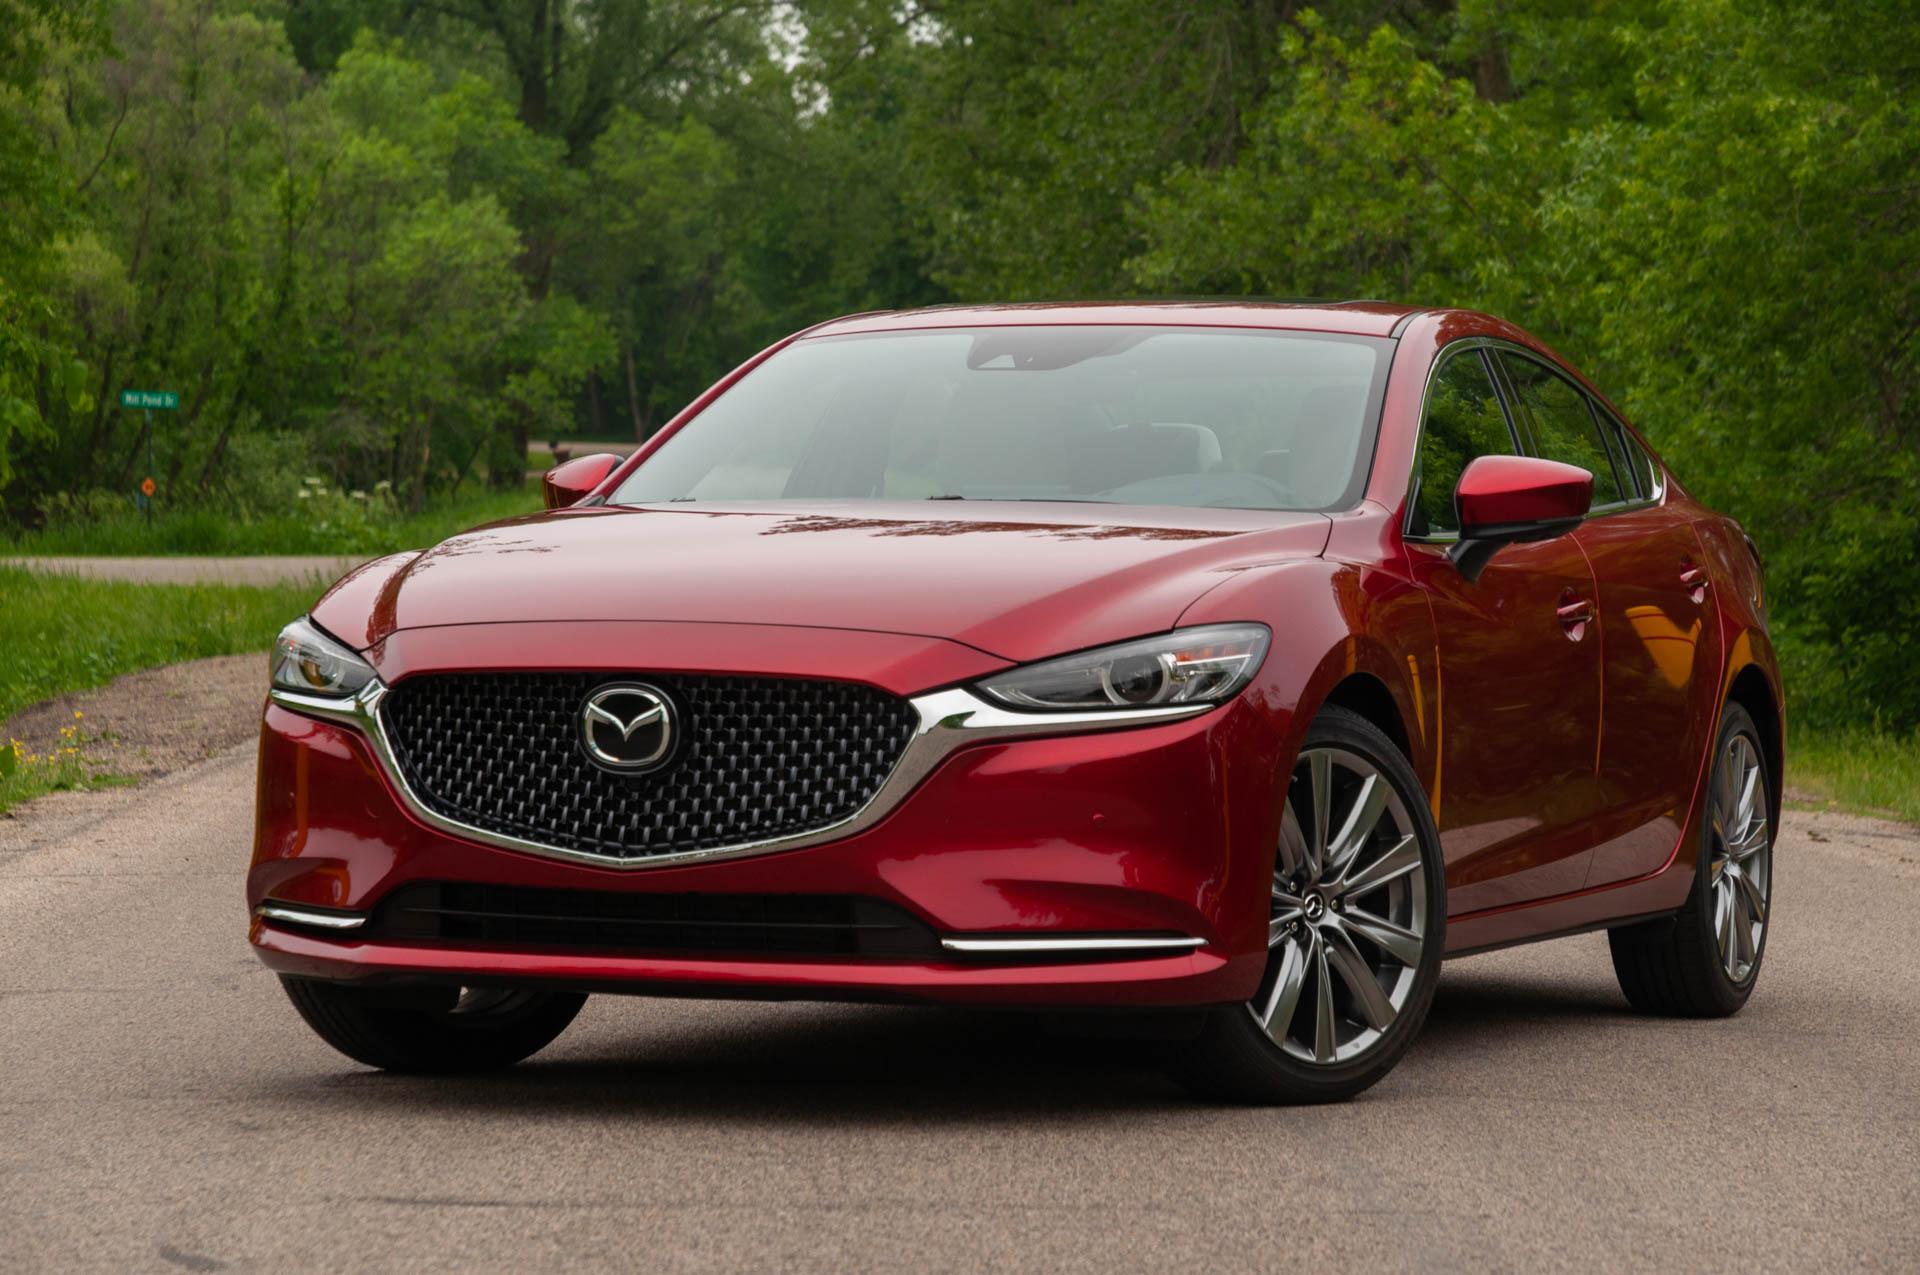 Kelebihan Mazda 2020 Harga